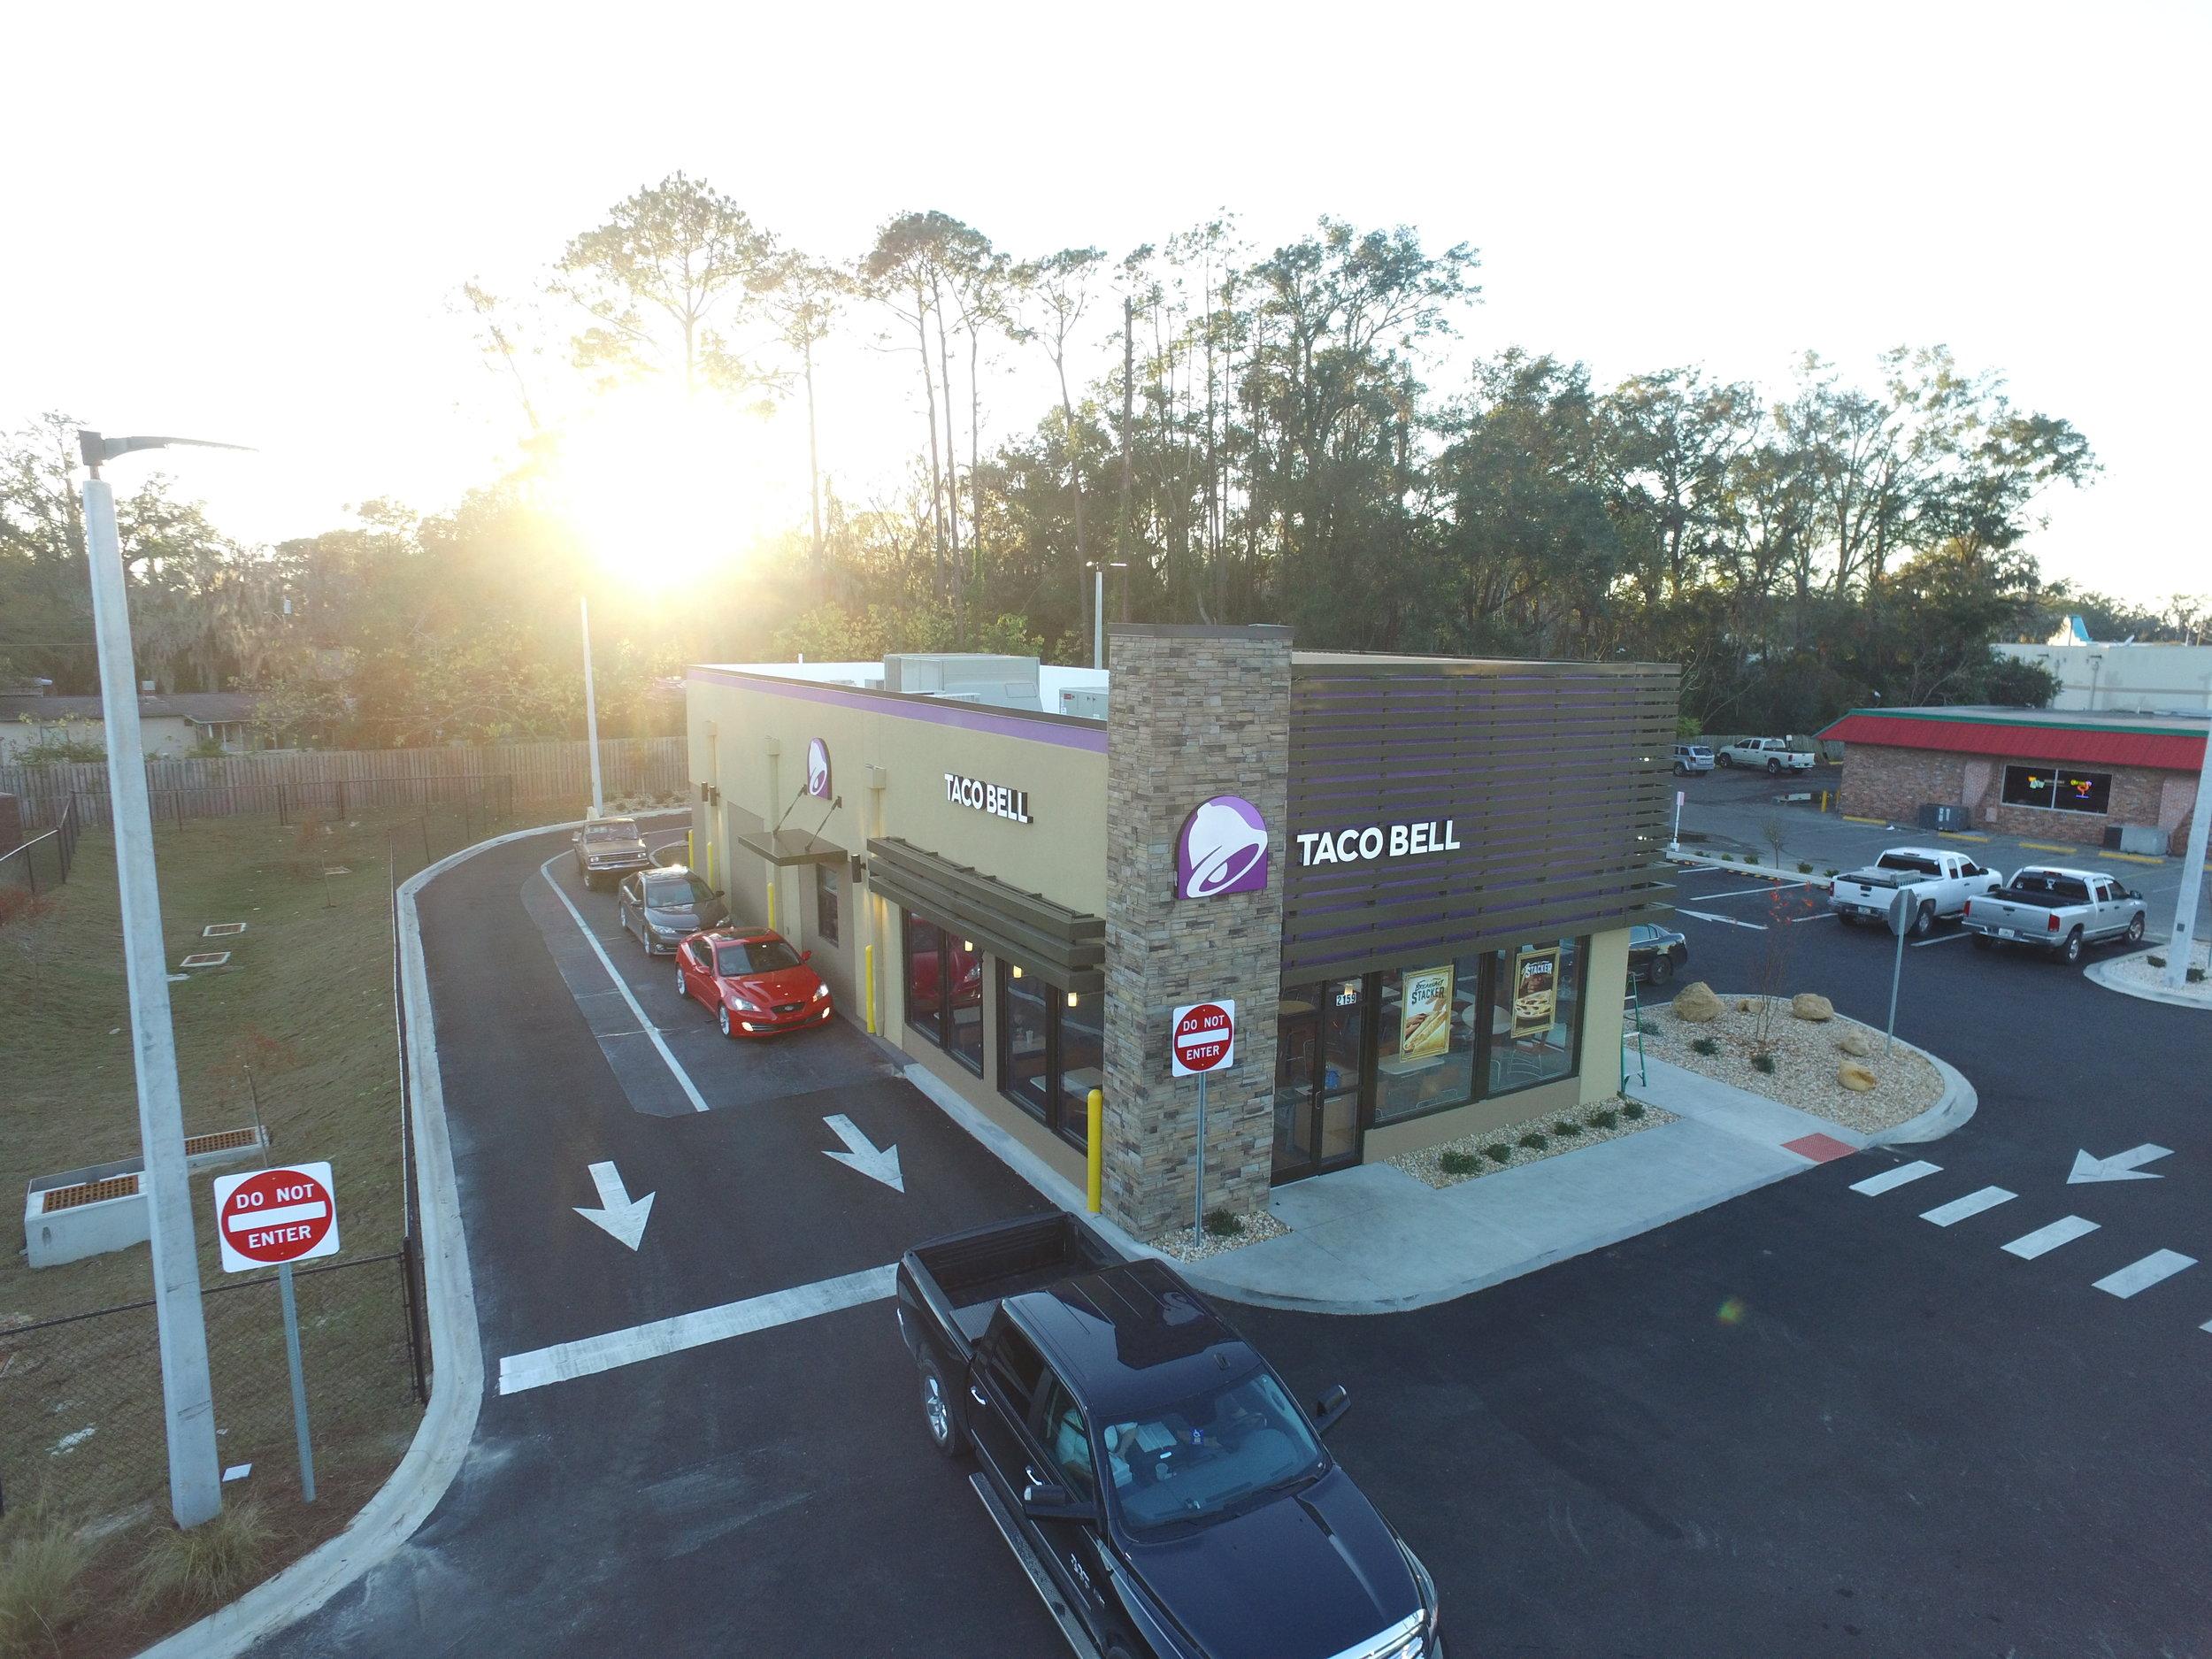 Verdad project - Peopeye's & Taco Bell - Perry, FL - 15.JPG